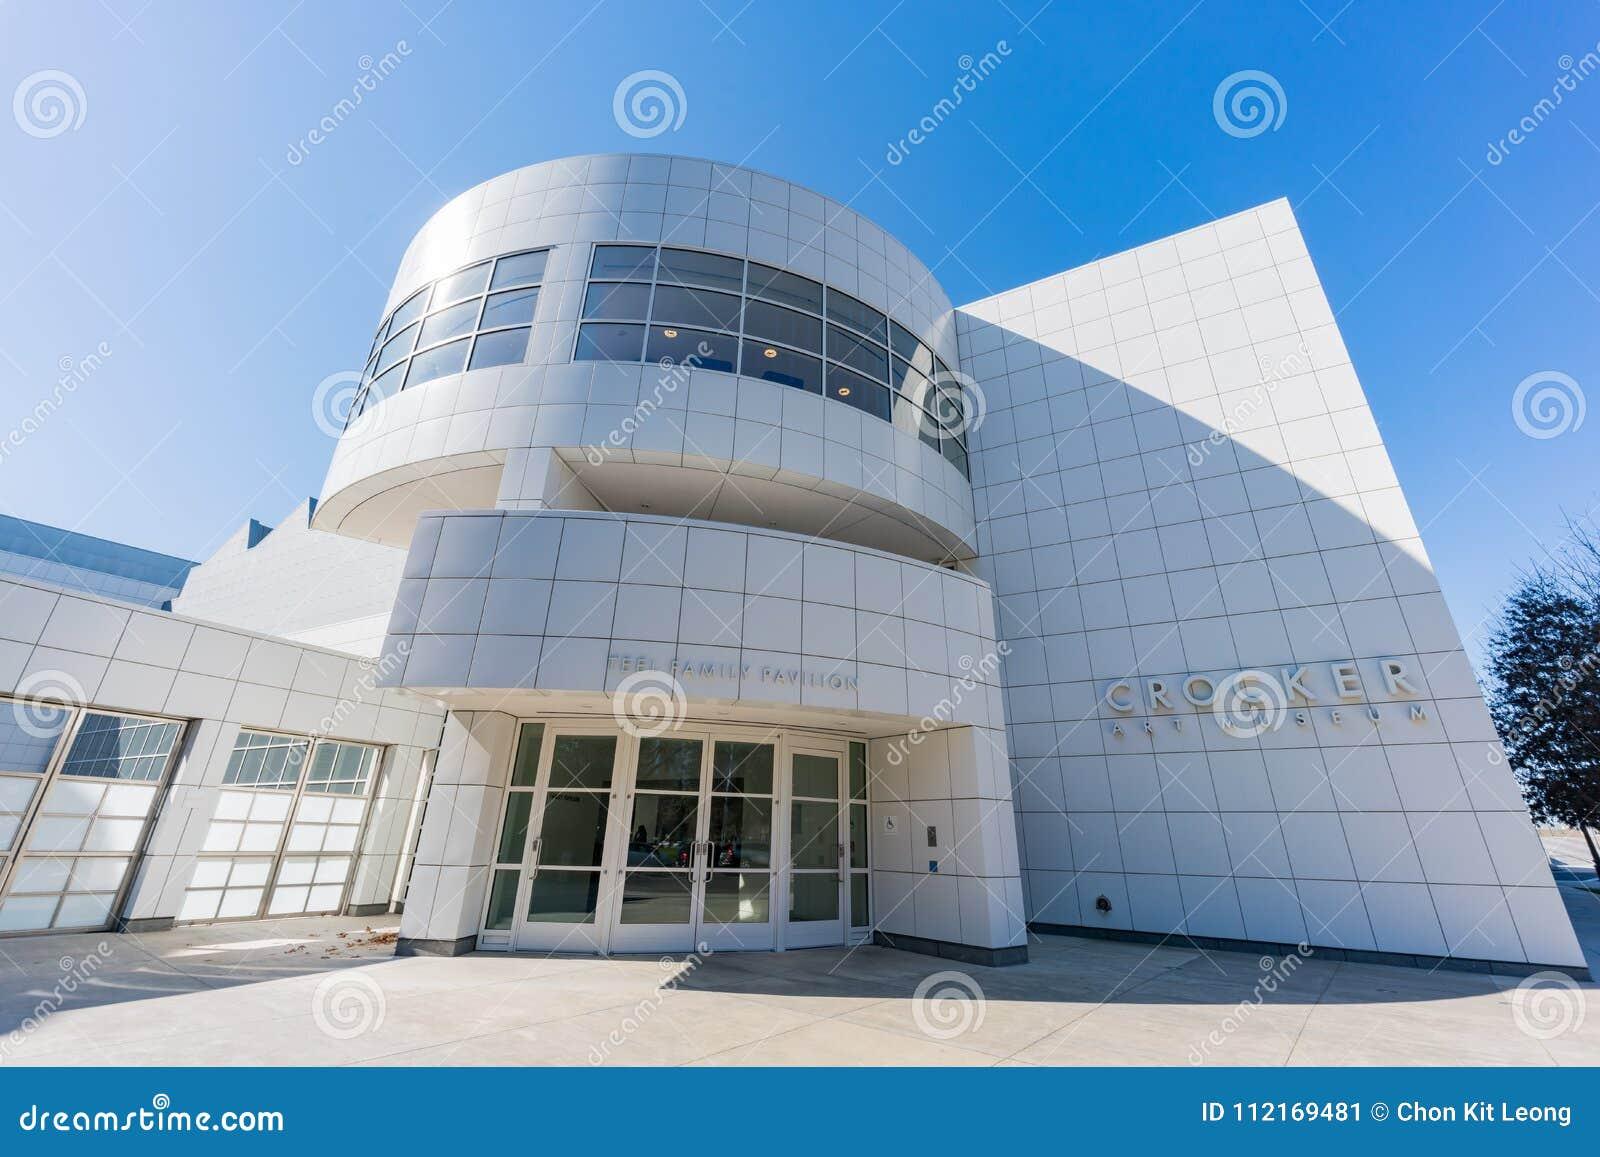 Buitenmening van beroemd Crocker Art Museum